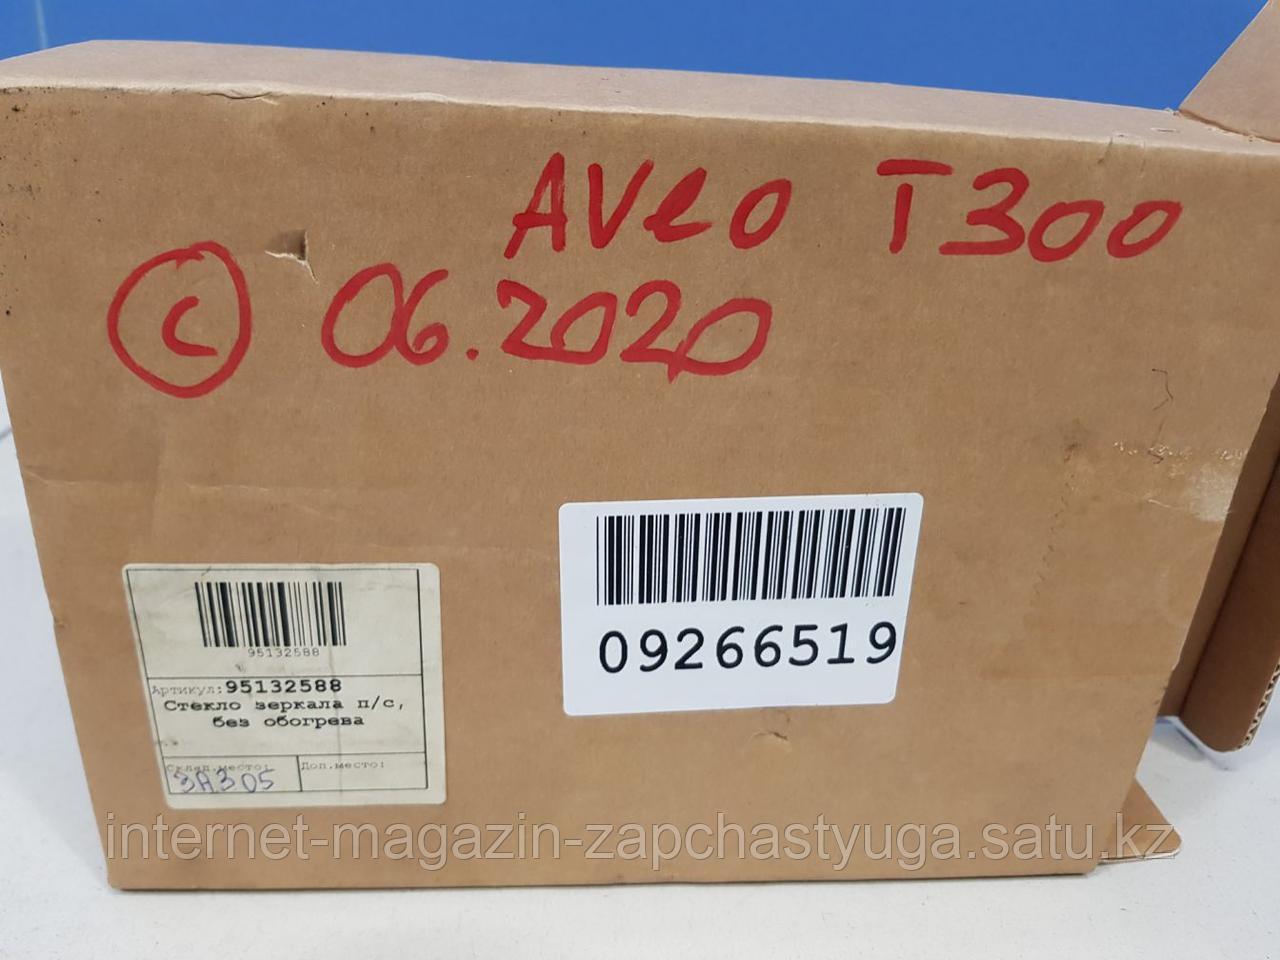 95132588 Зеркальный элемент правый для Chevrolet Aveo T300 2011-2015 Б/У - фото 5